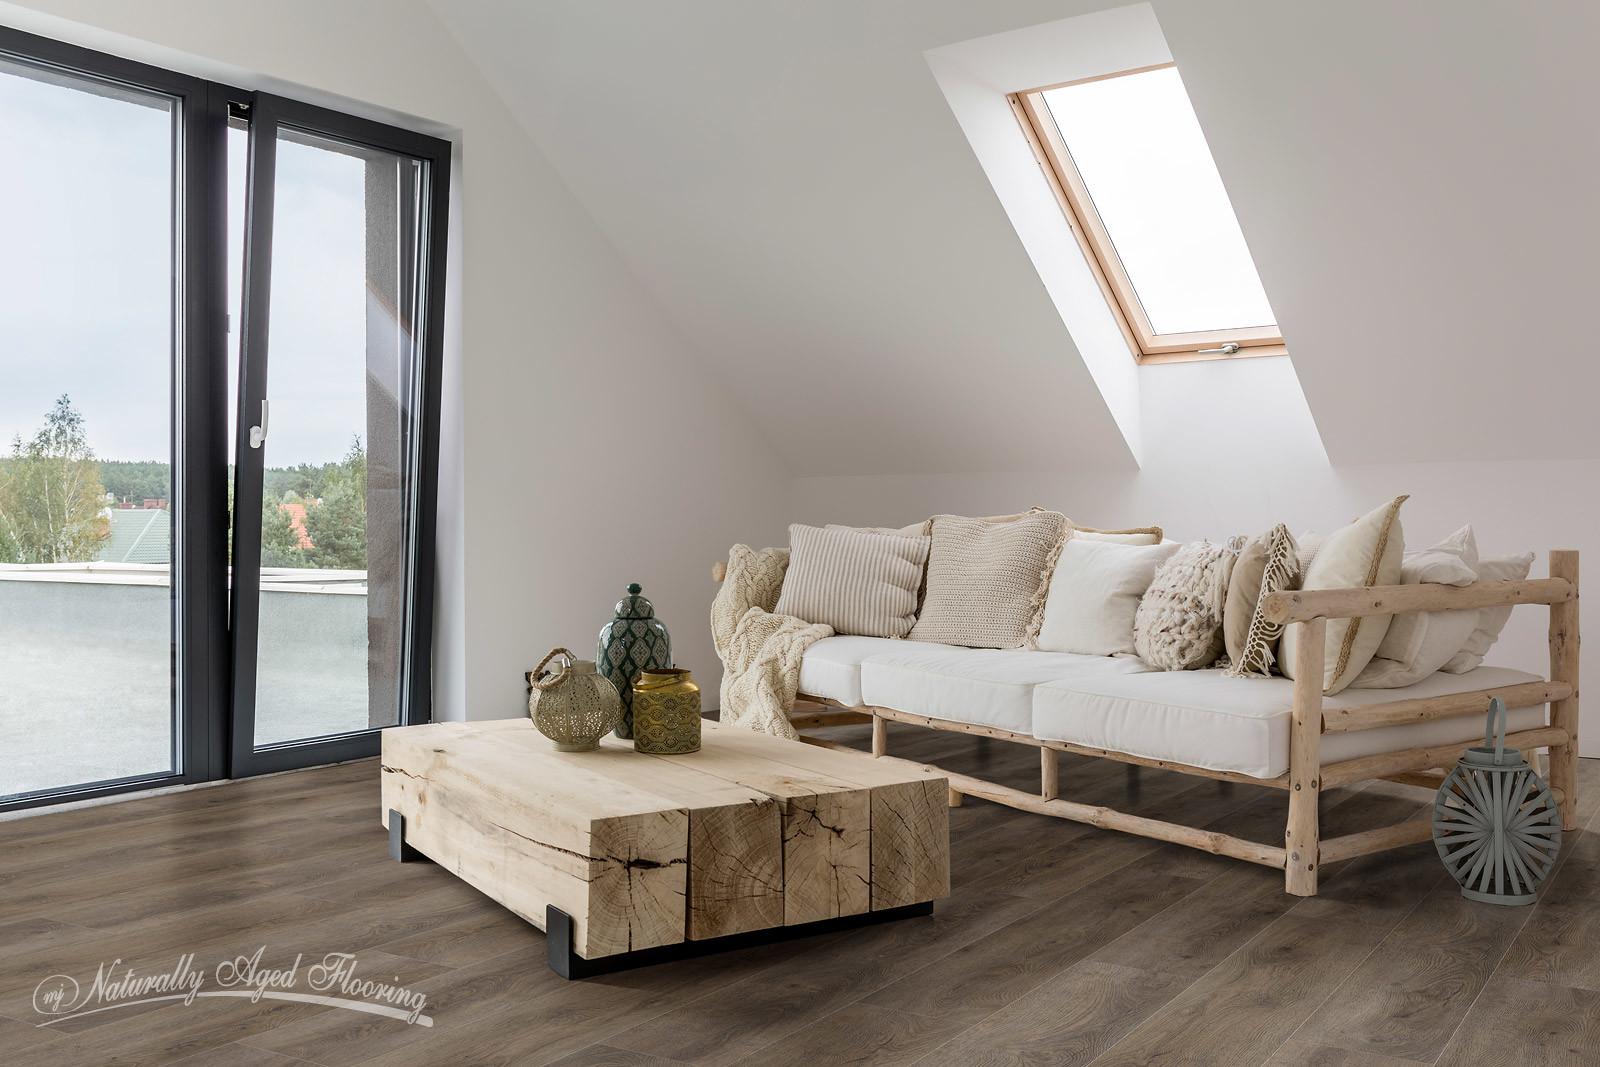 9 Quot Greystone Naturally Aged Flooring